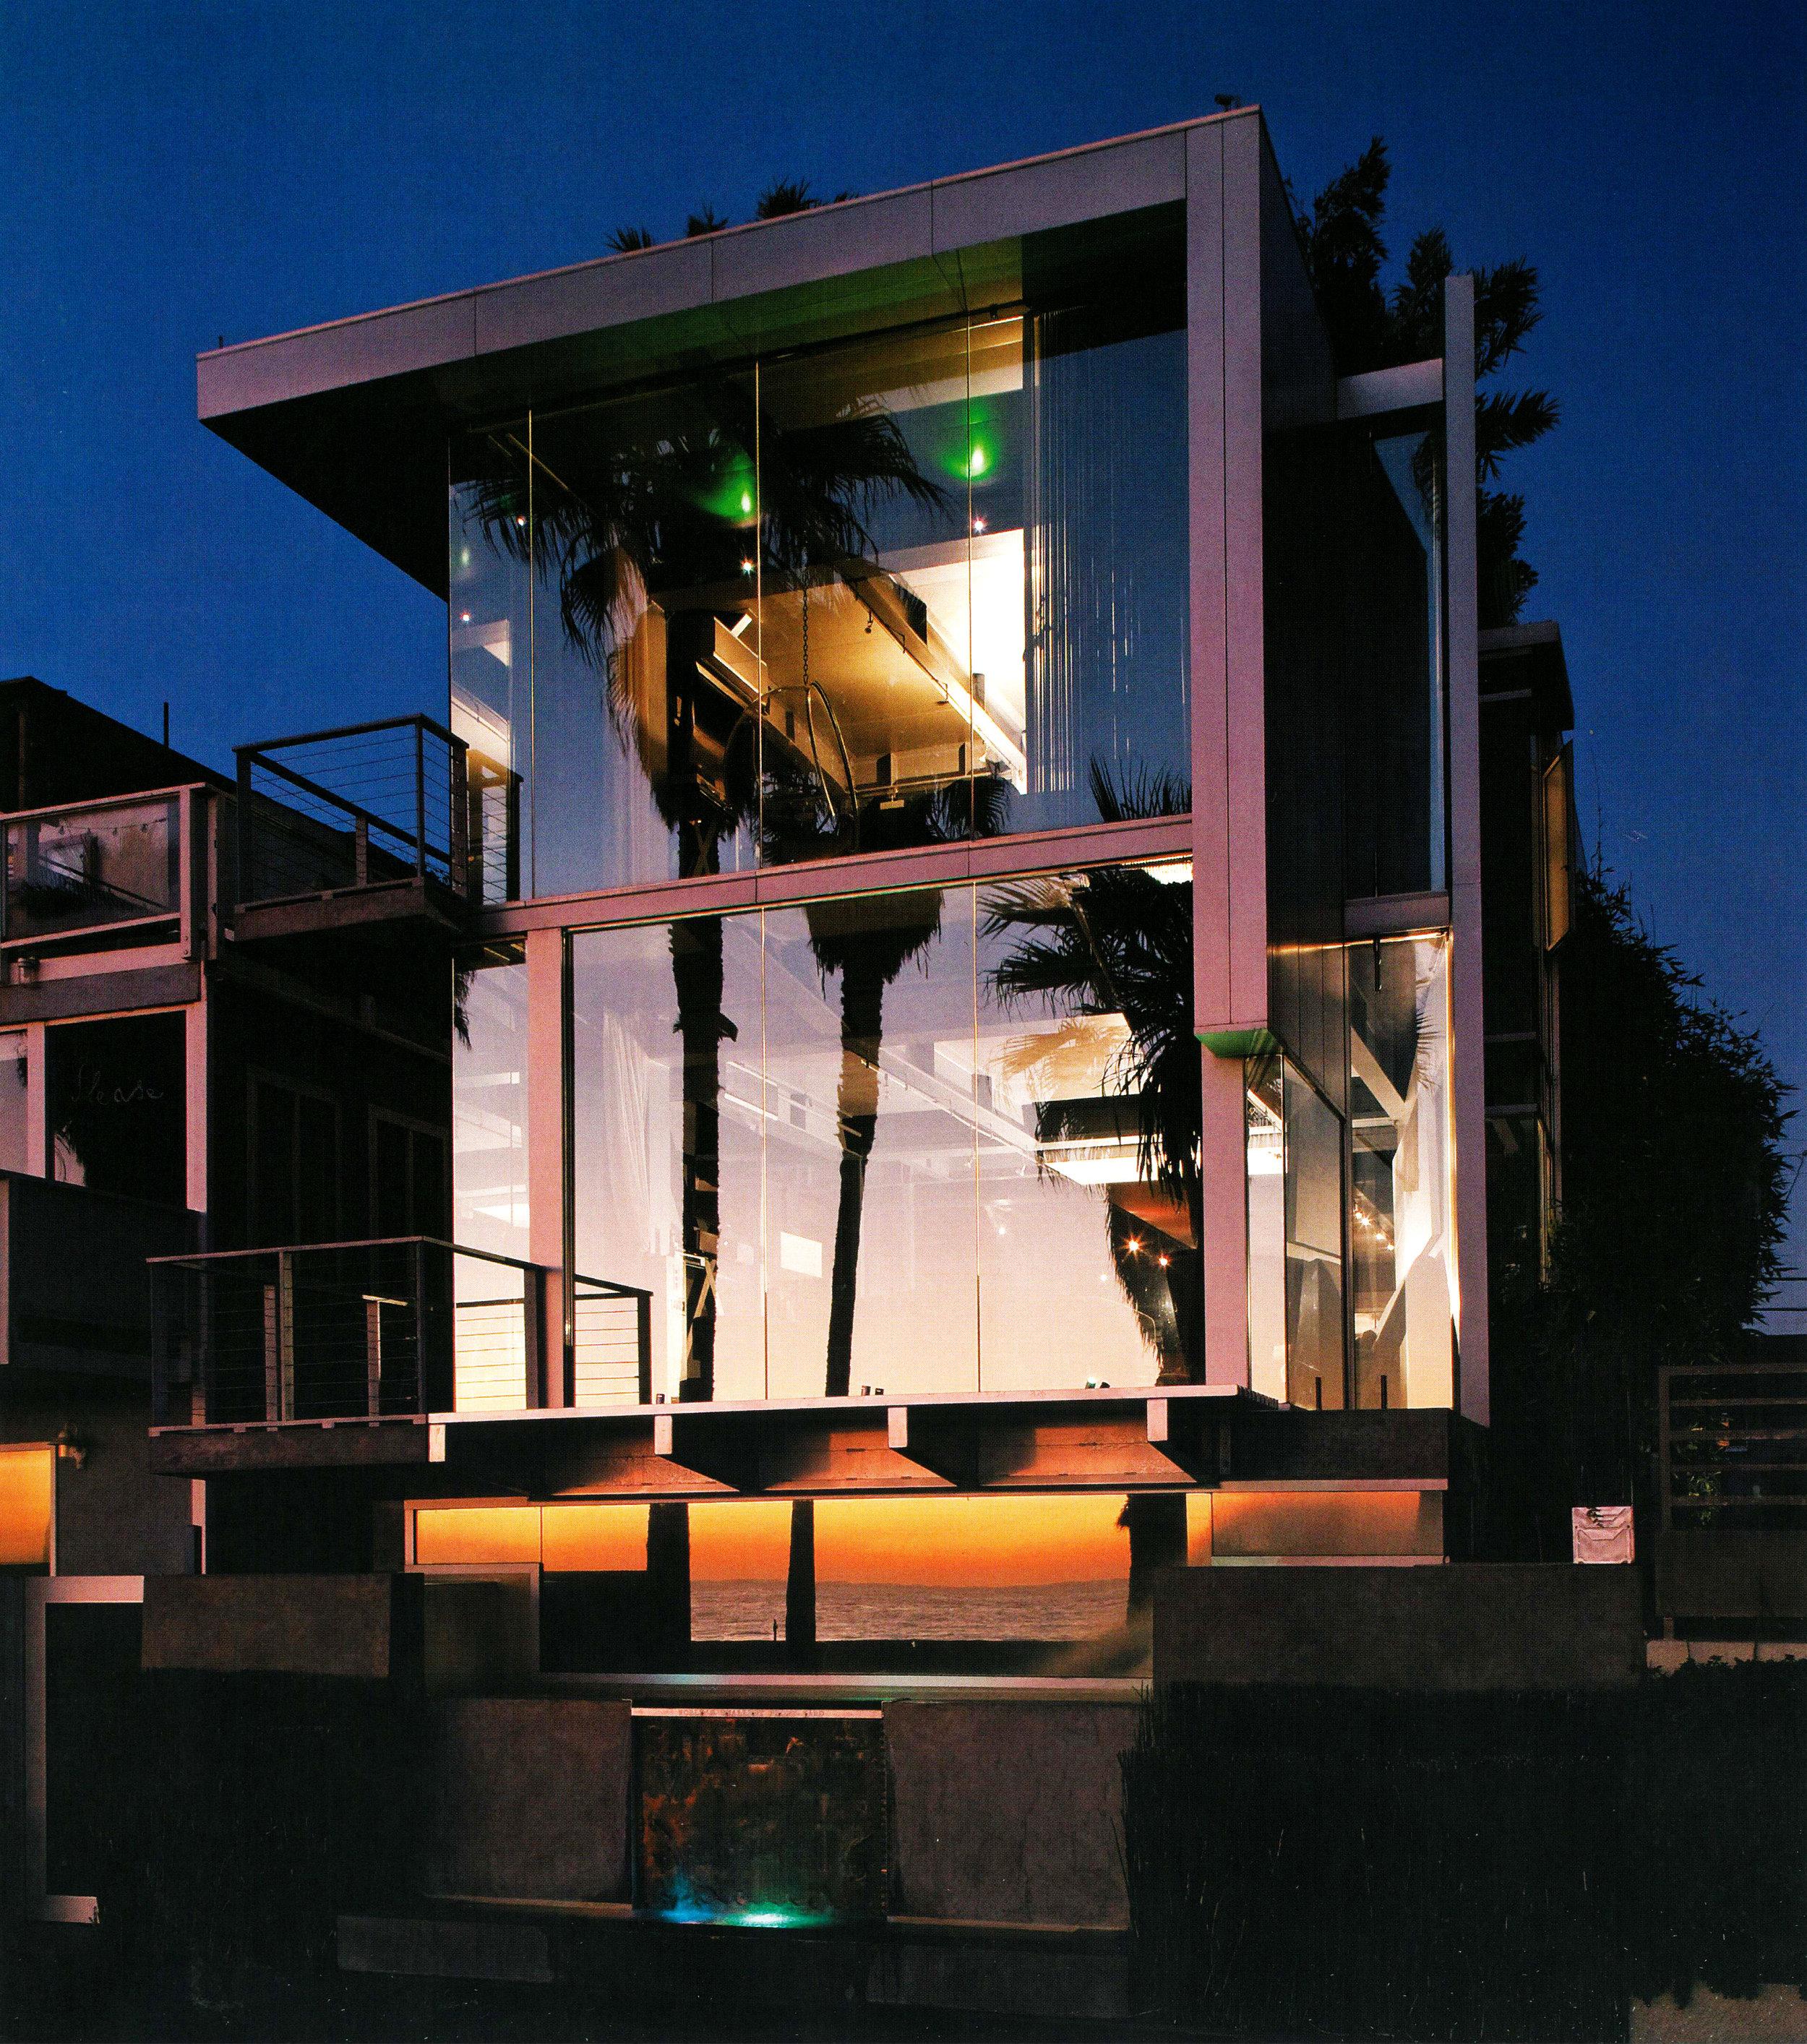 S.E.A.-Studio-Environmental-Architecture-David-Hertz-FAIA-Panel-House-Venice-Beach-California-sustainable-regenerative-restorative-green-design-prefabricated-aluminum-refrigeration-open-concept-ocean-view-residential-glass-steel-sunset-exterior-20.jpg